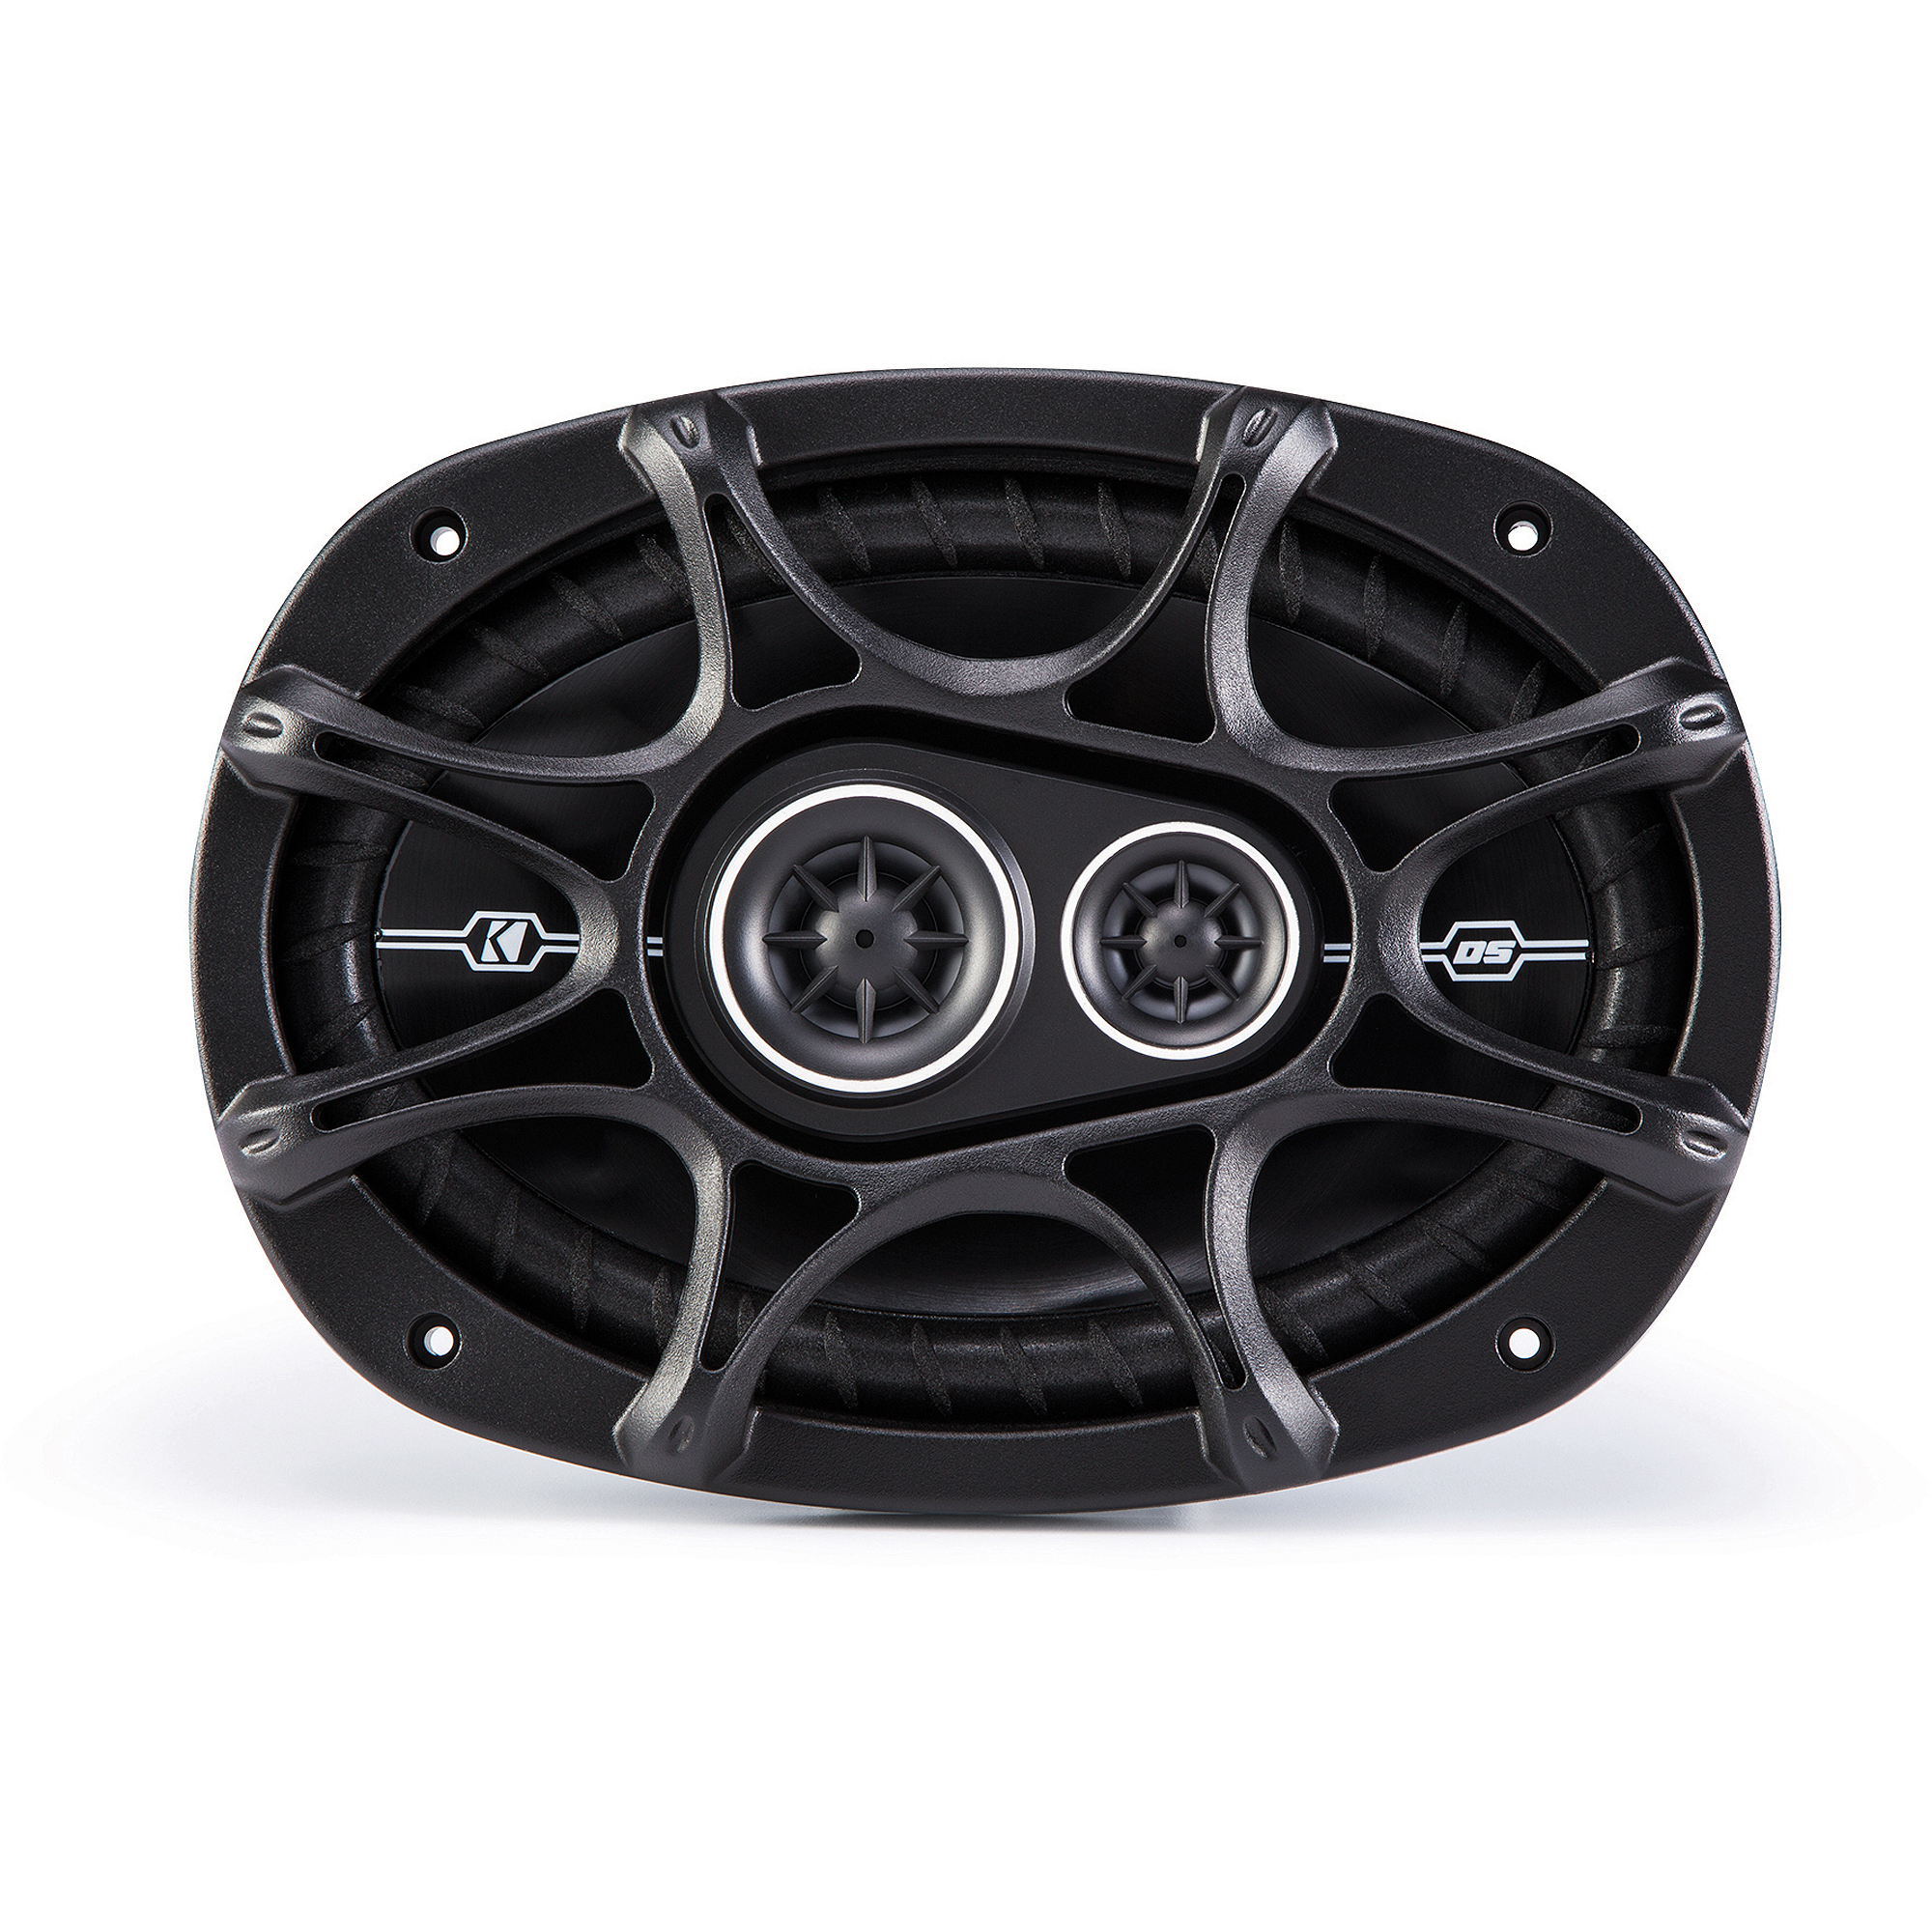 "Kicker DSC6934 6"" x 9"" 3-Way Speakers with 1/2"" Tweeters"